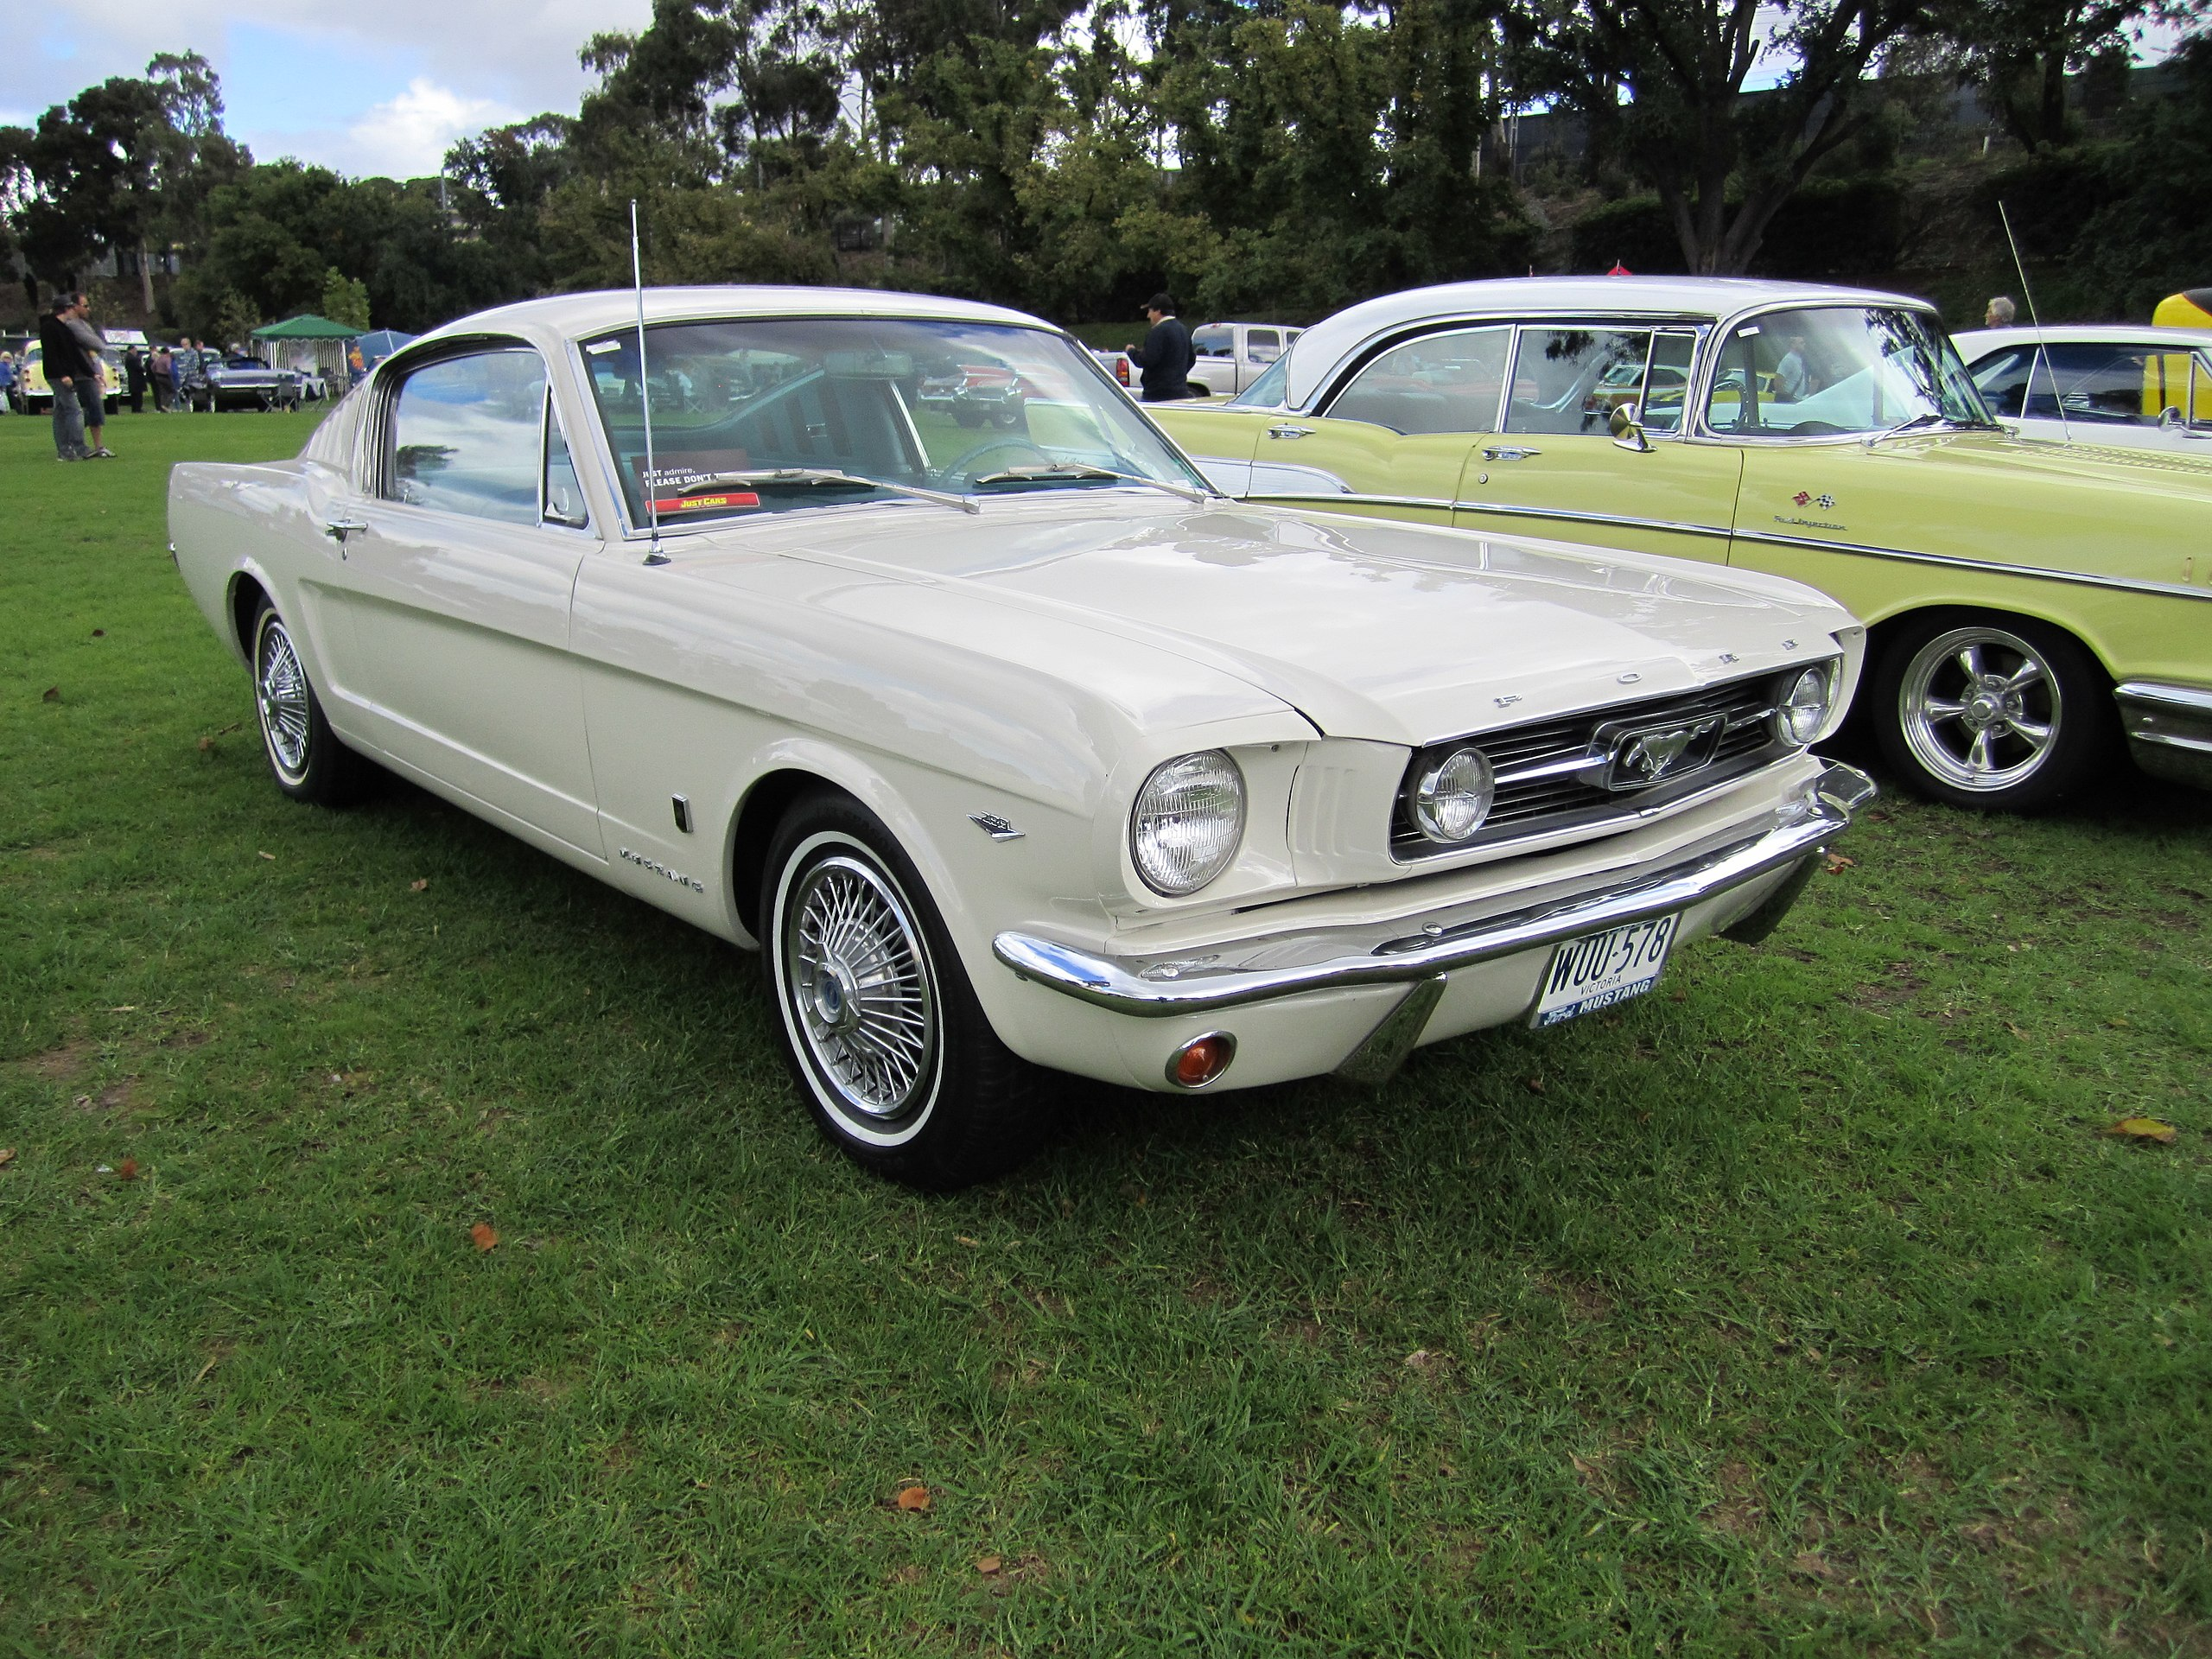 1966 Mustang Fastback GT white - best mustangs